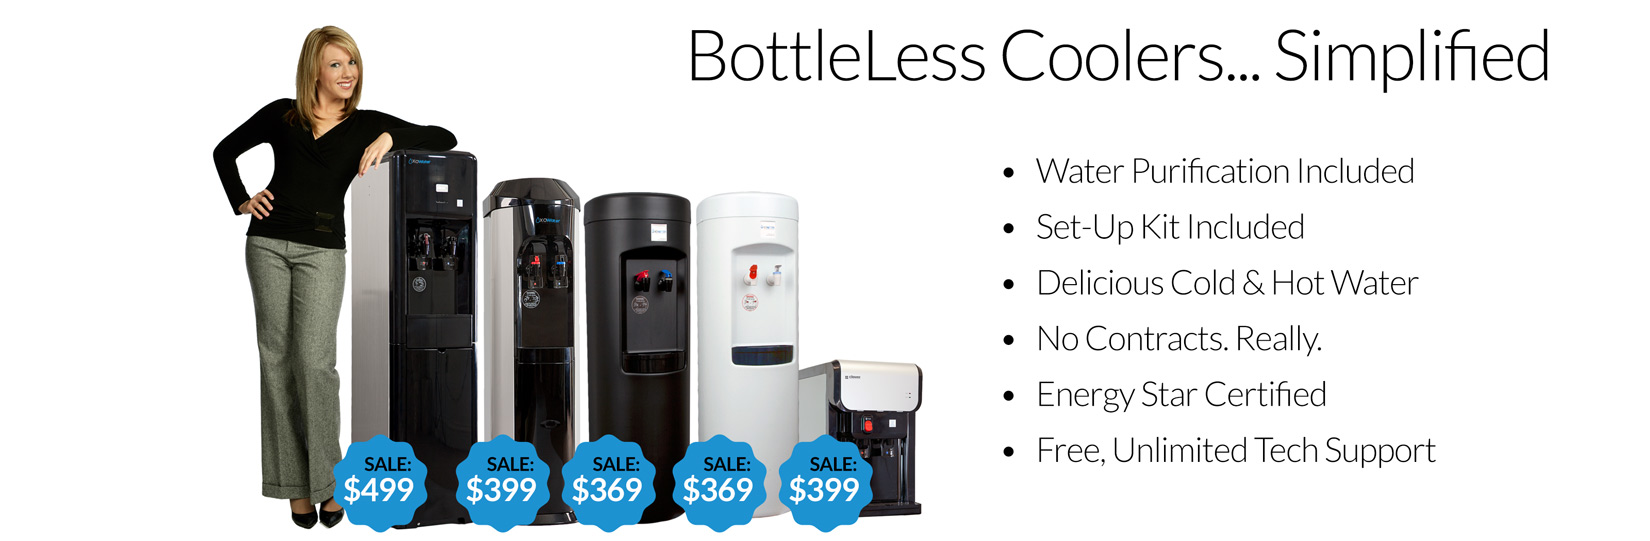 XO bottleless water coolers shop landing pic